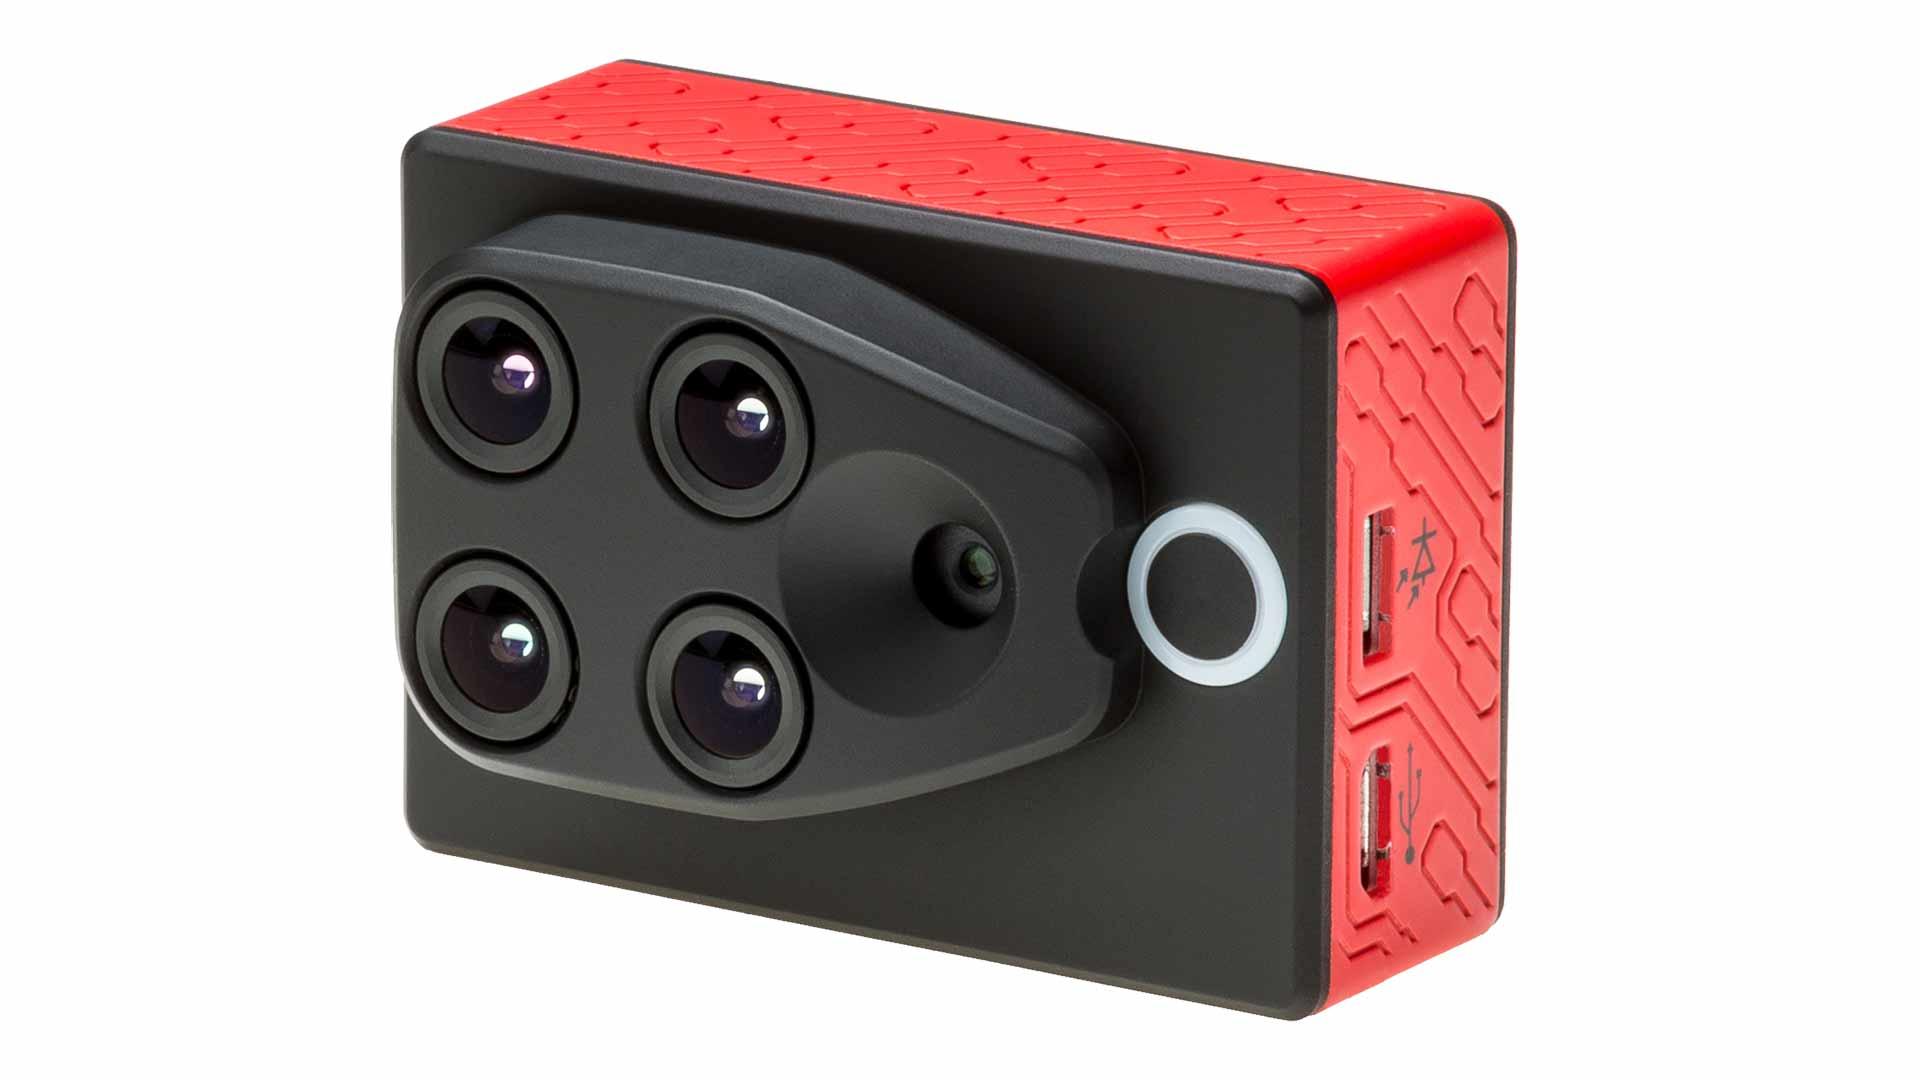 pix4d-parrot-sequoia-multispectral-camera